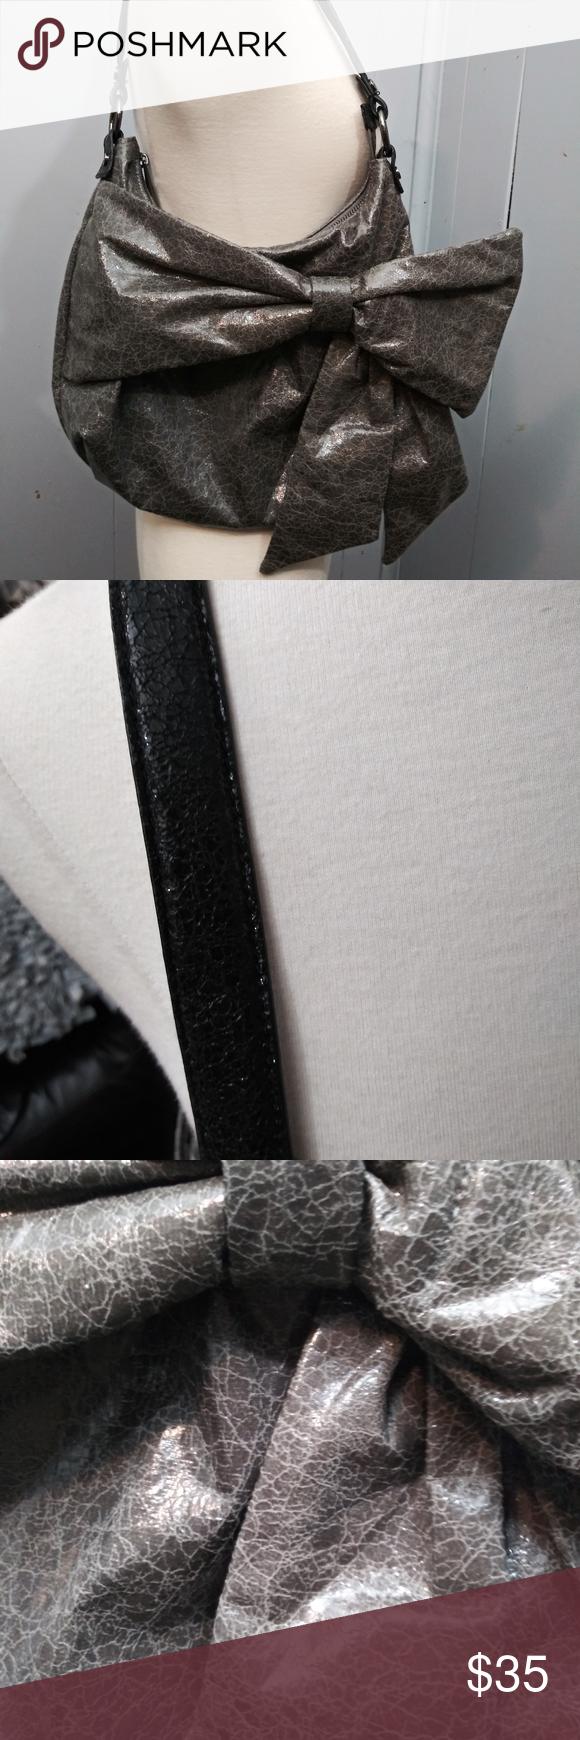 Simply Vera Hobo Purse w/Bow Grey/Black Large hobo bag in a beigey grey crackle …